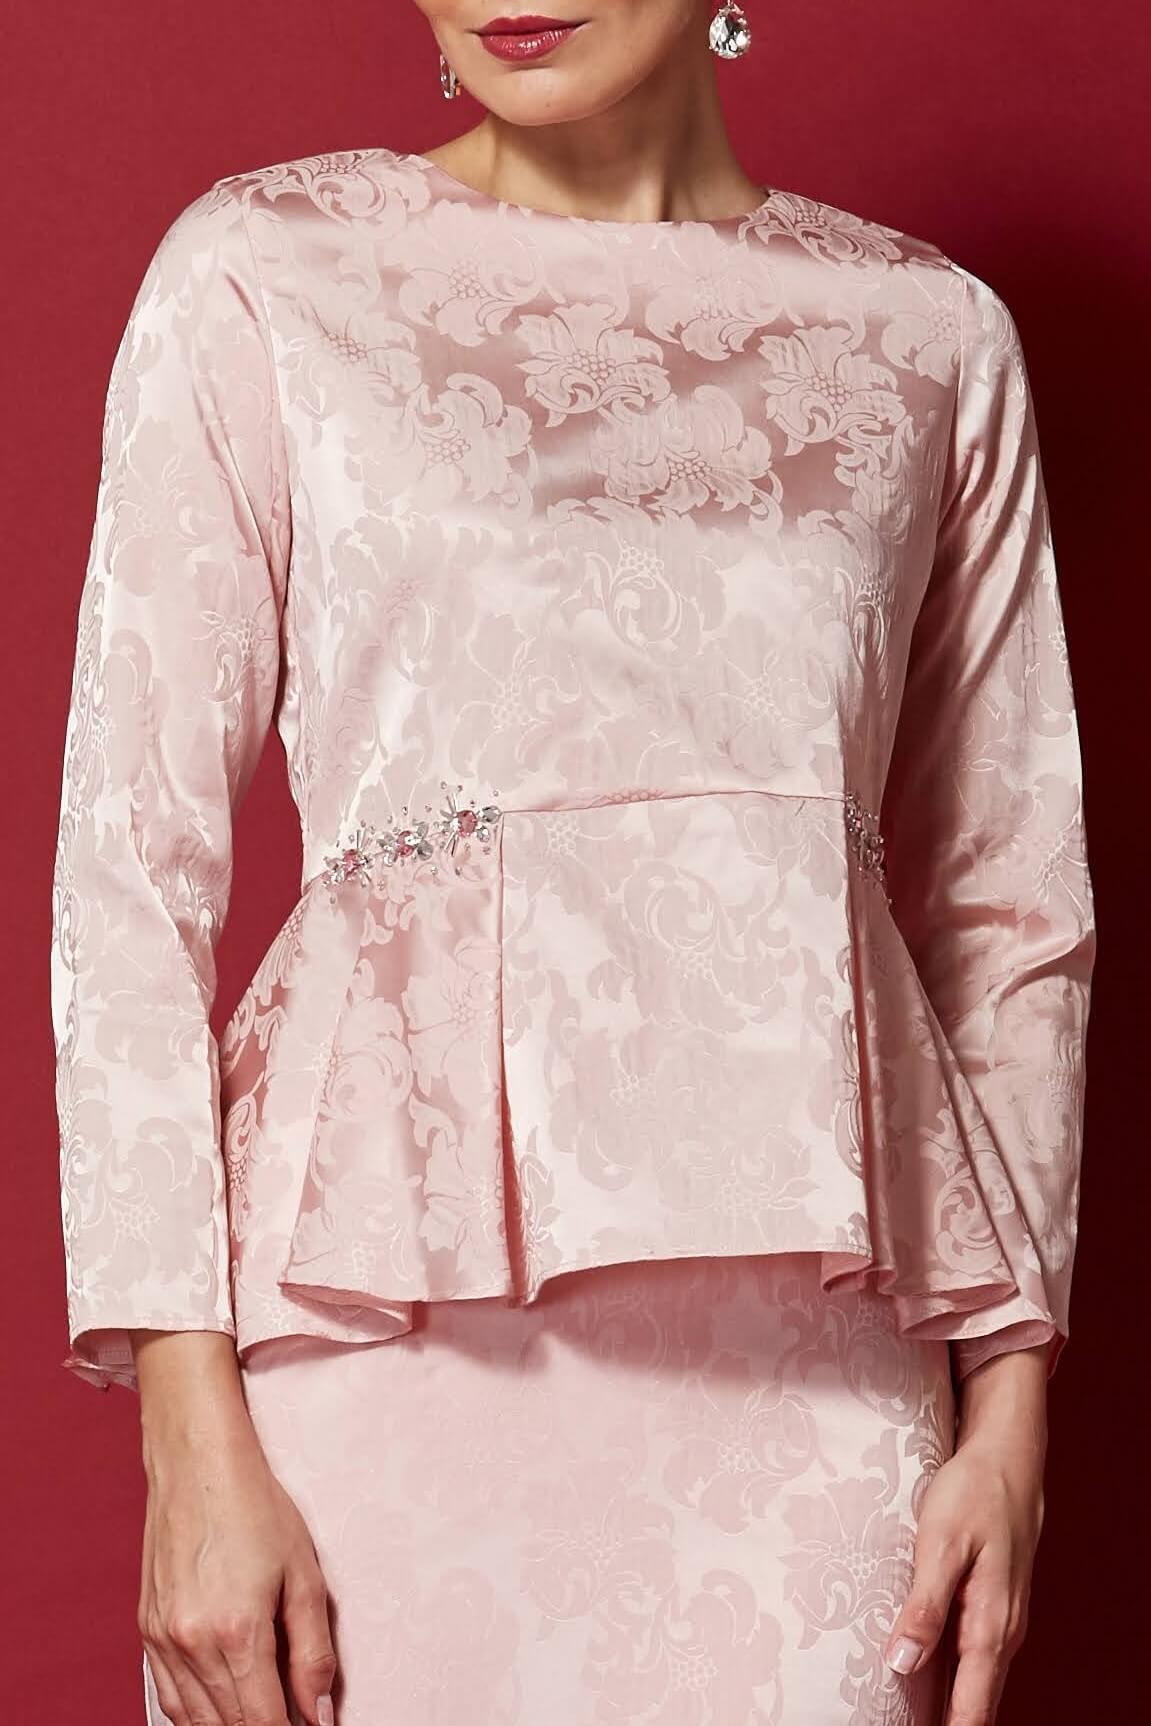 Pink Peplum Top With Embellishment (2)